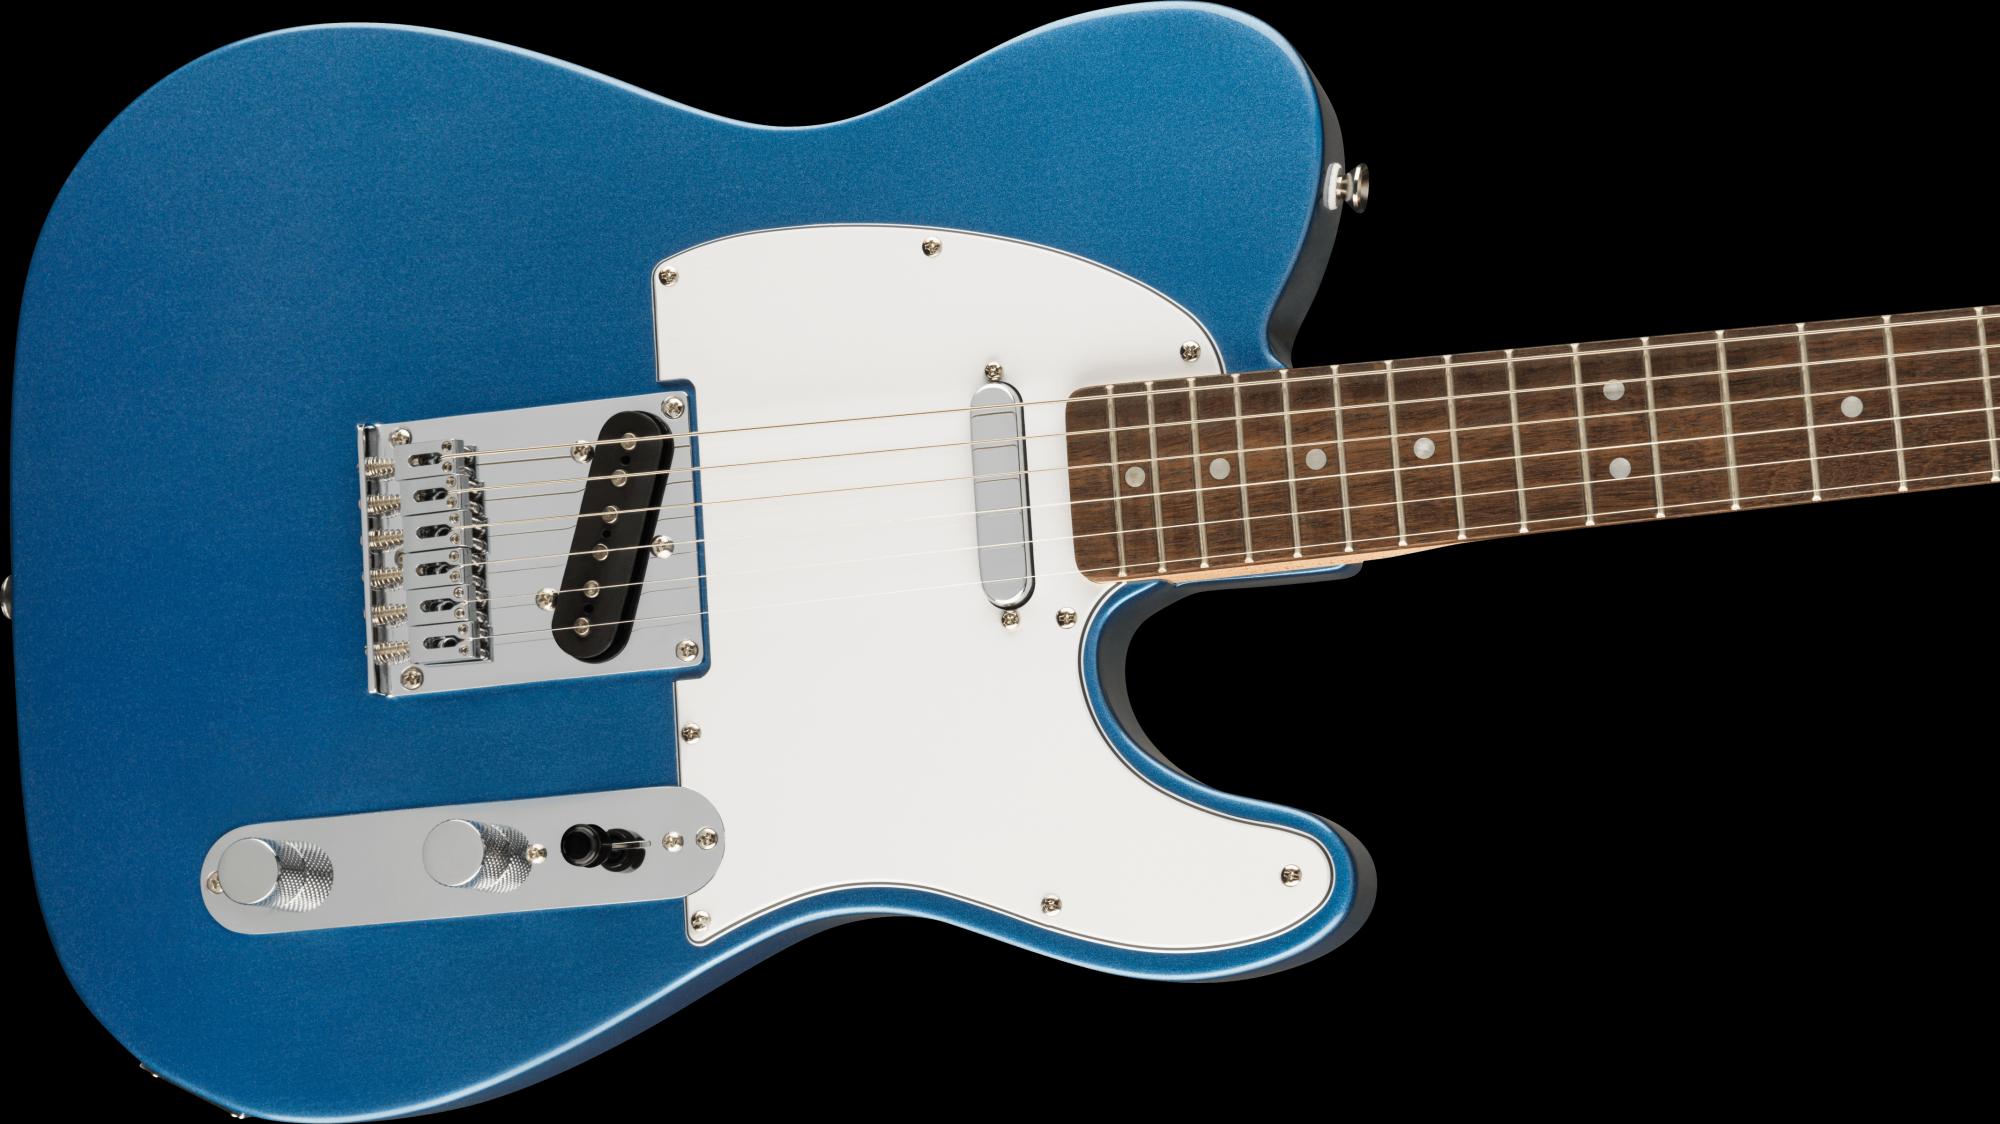 Fender Squier Affinity Series Telecaster - Lake Placid Blue